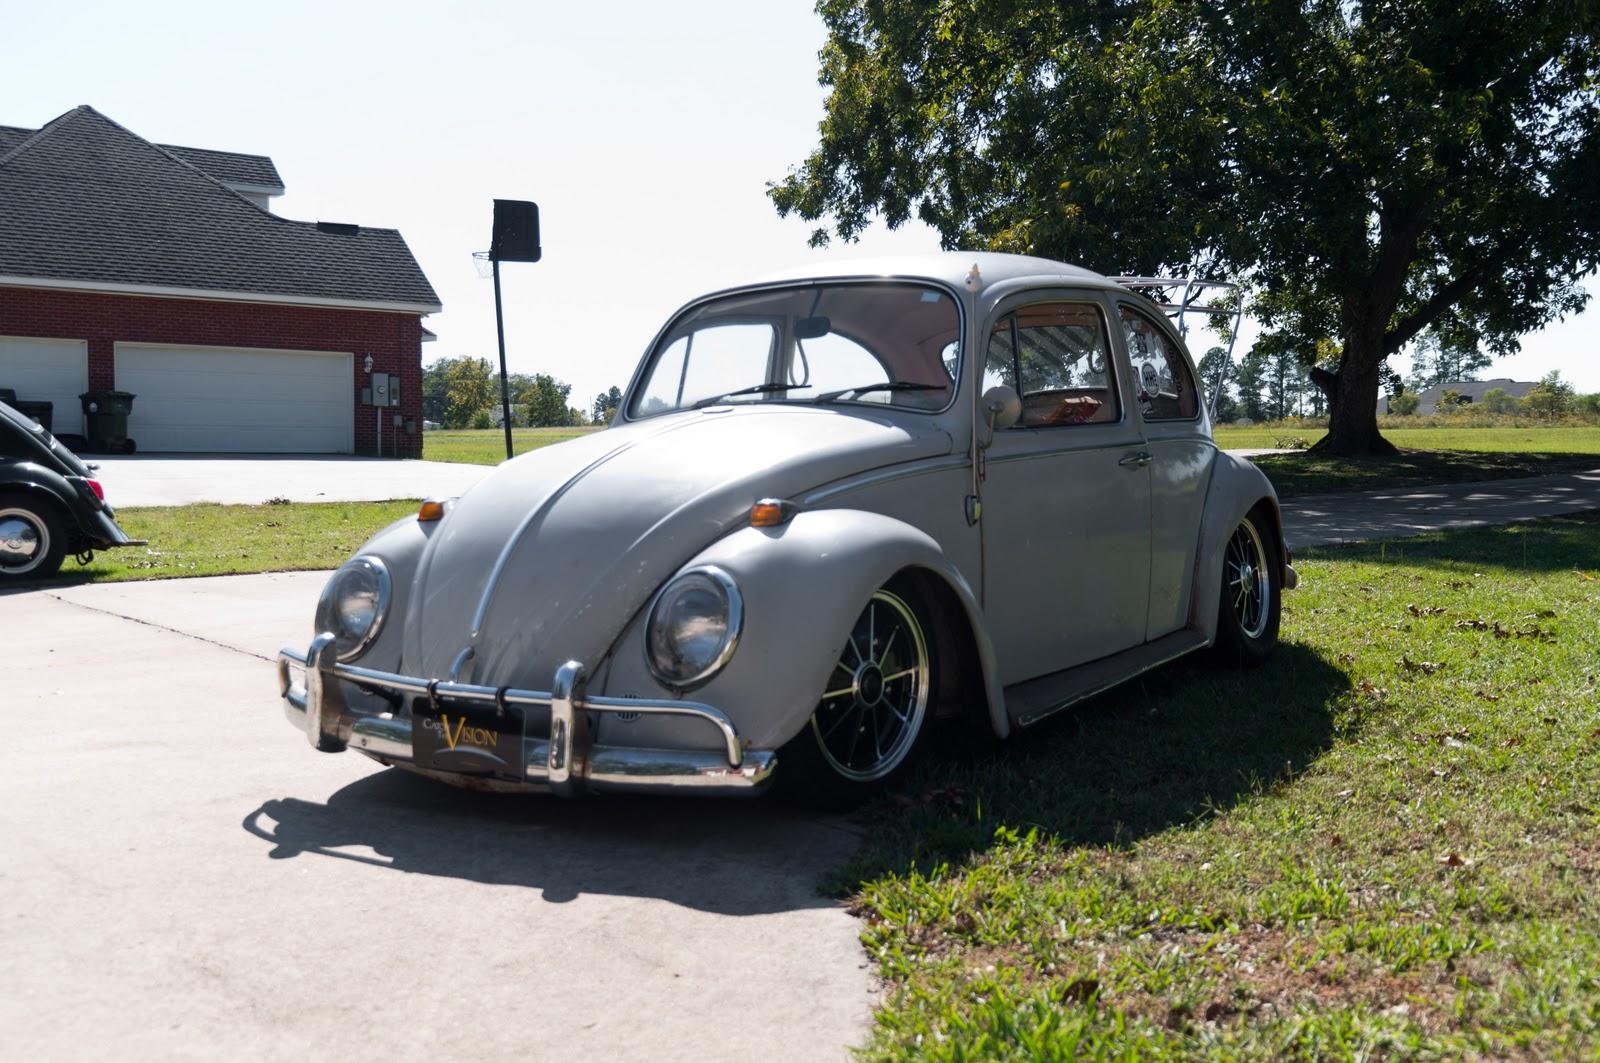 Otis - my '65 Beetle DSC_0003